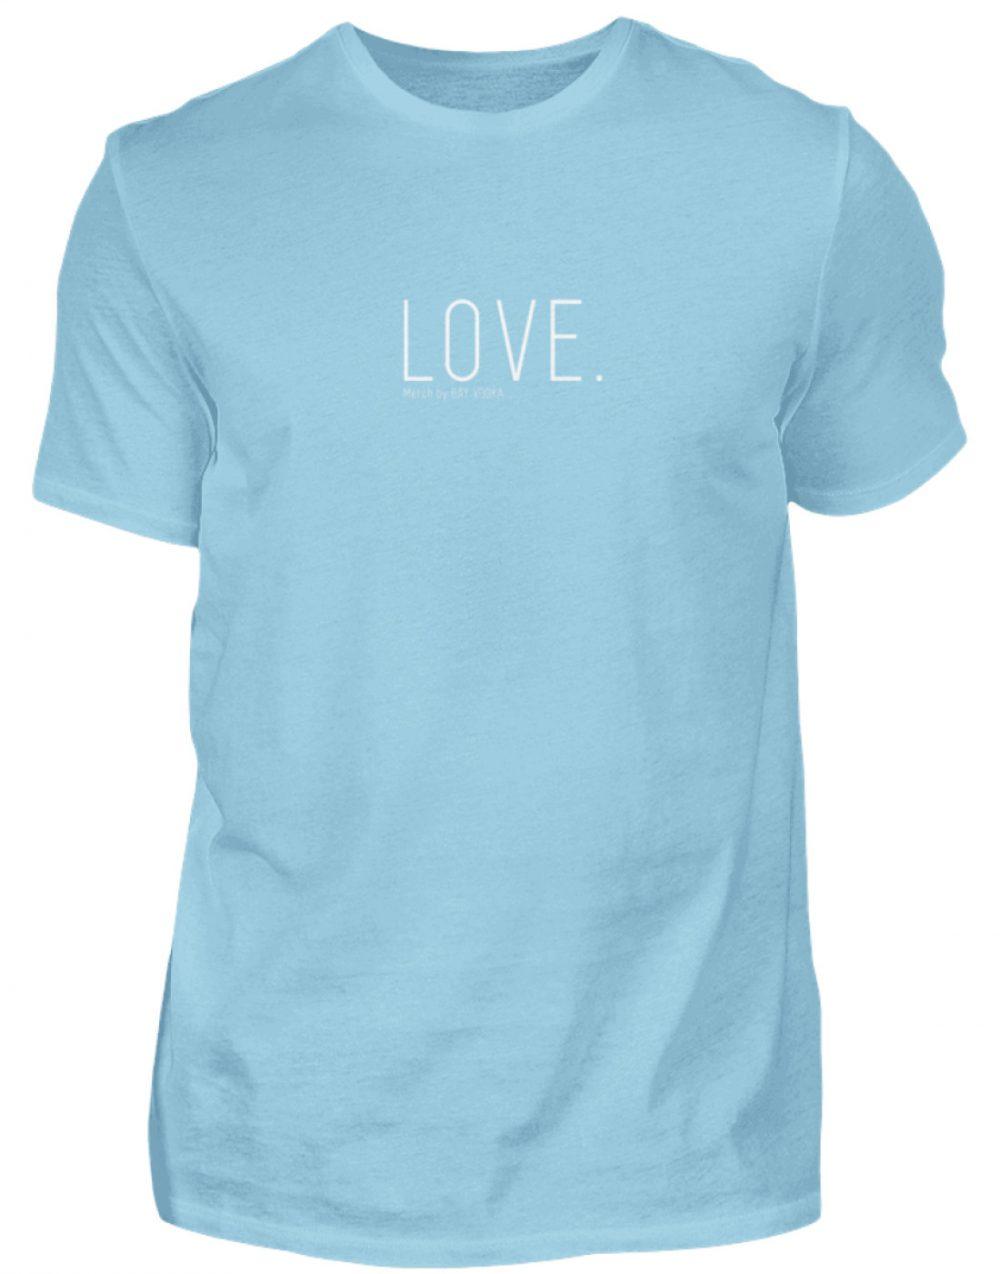 LOVE. - Herren Shirt-674